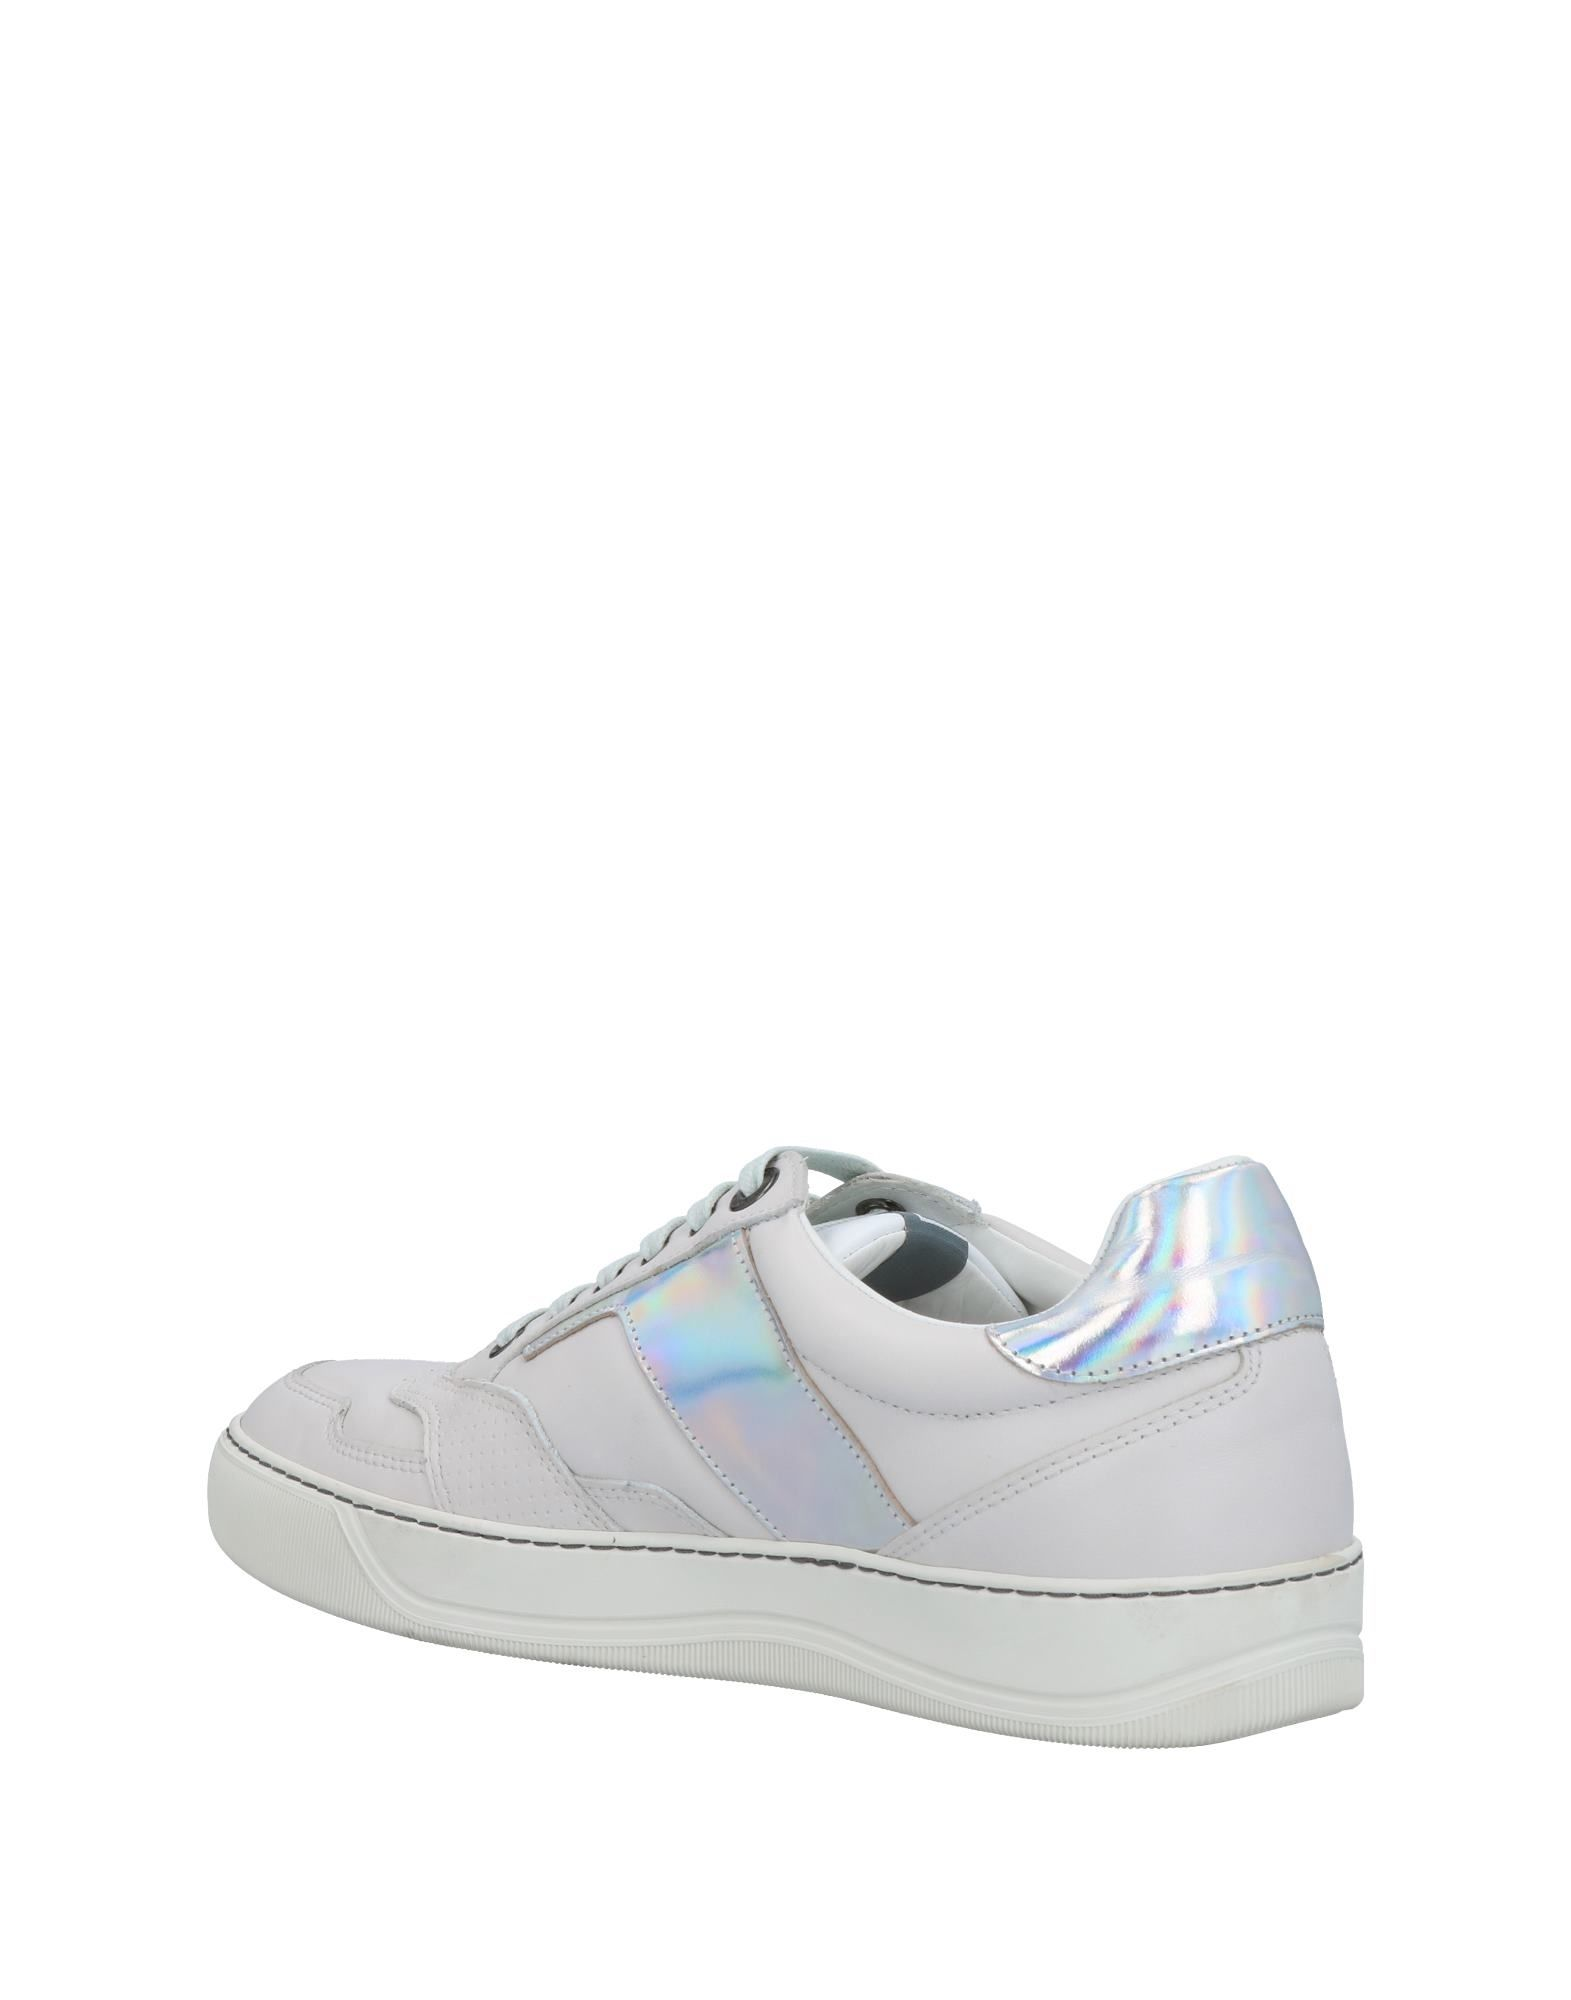 Lanvin Sneakers Herren  11372468CA Schuhe Gute Qualität beliebte Schuhe 11372468CA 7ff5af